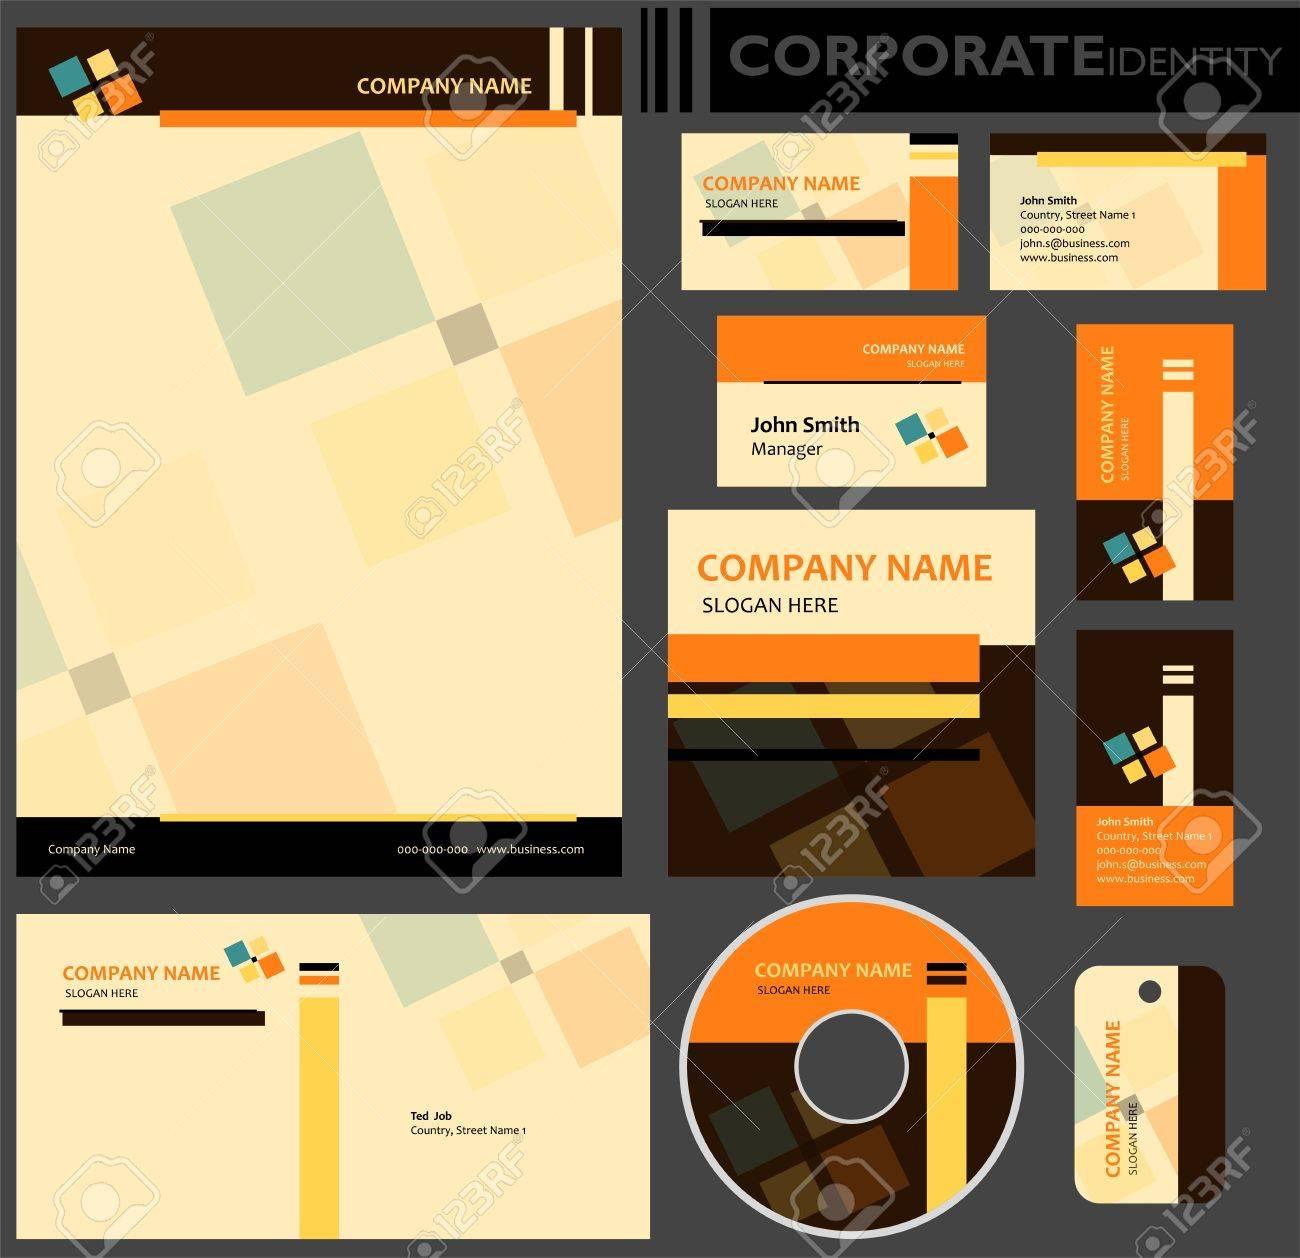 Corporate Identity Template Editable Set Design Including Business ...